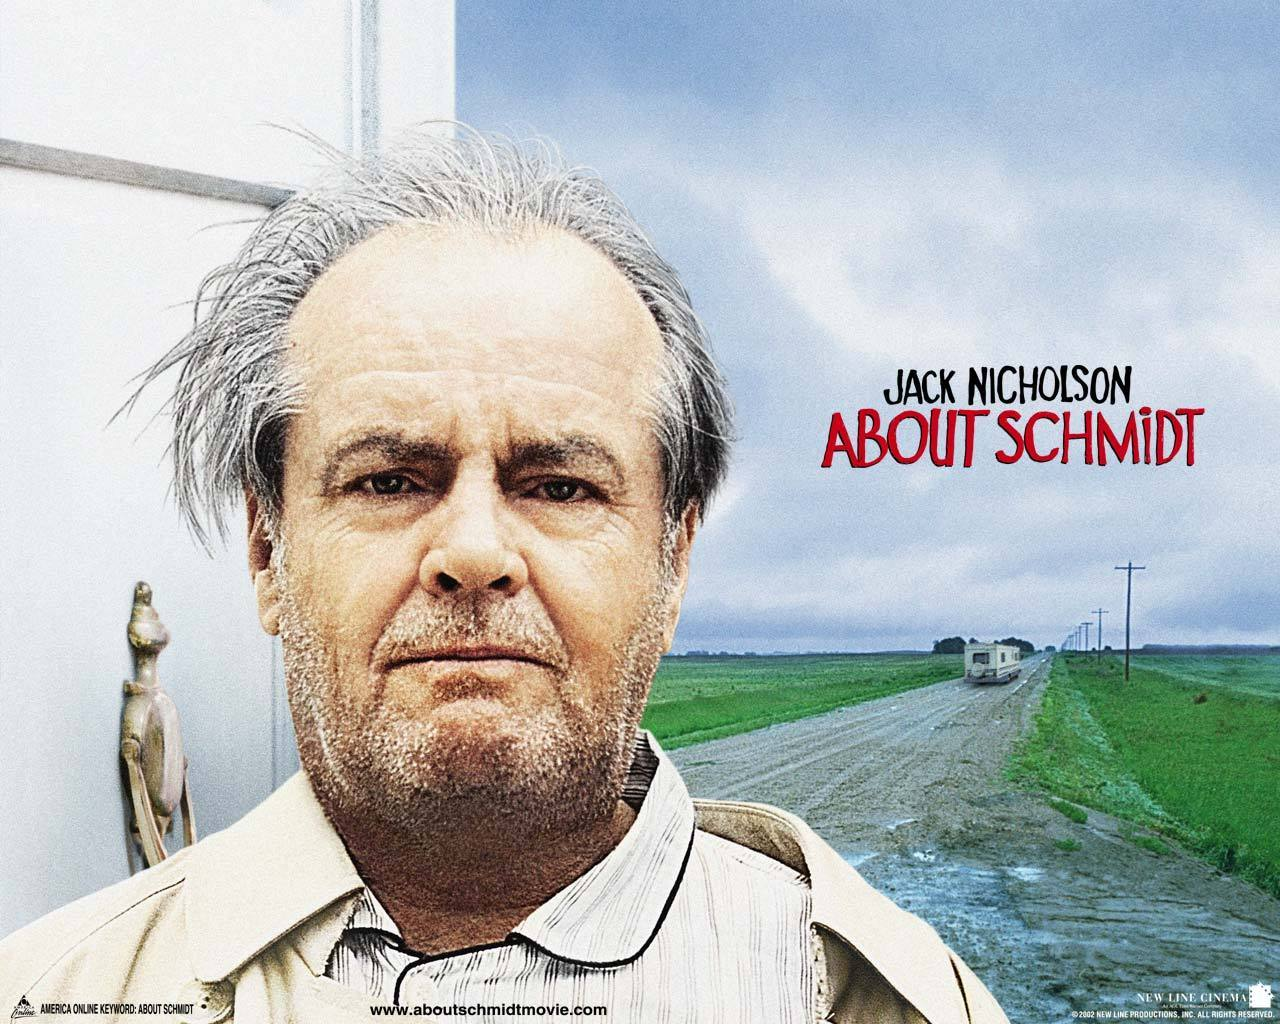 Jack Nicholson images Jack Nicholson wallpaper photos 20162155 1280x1024